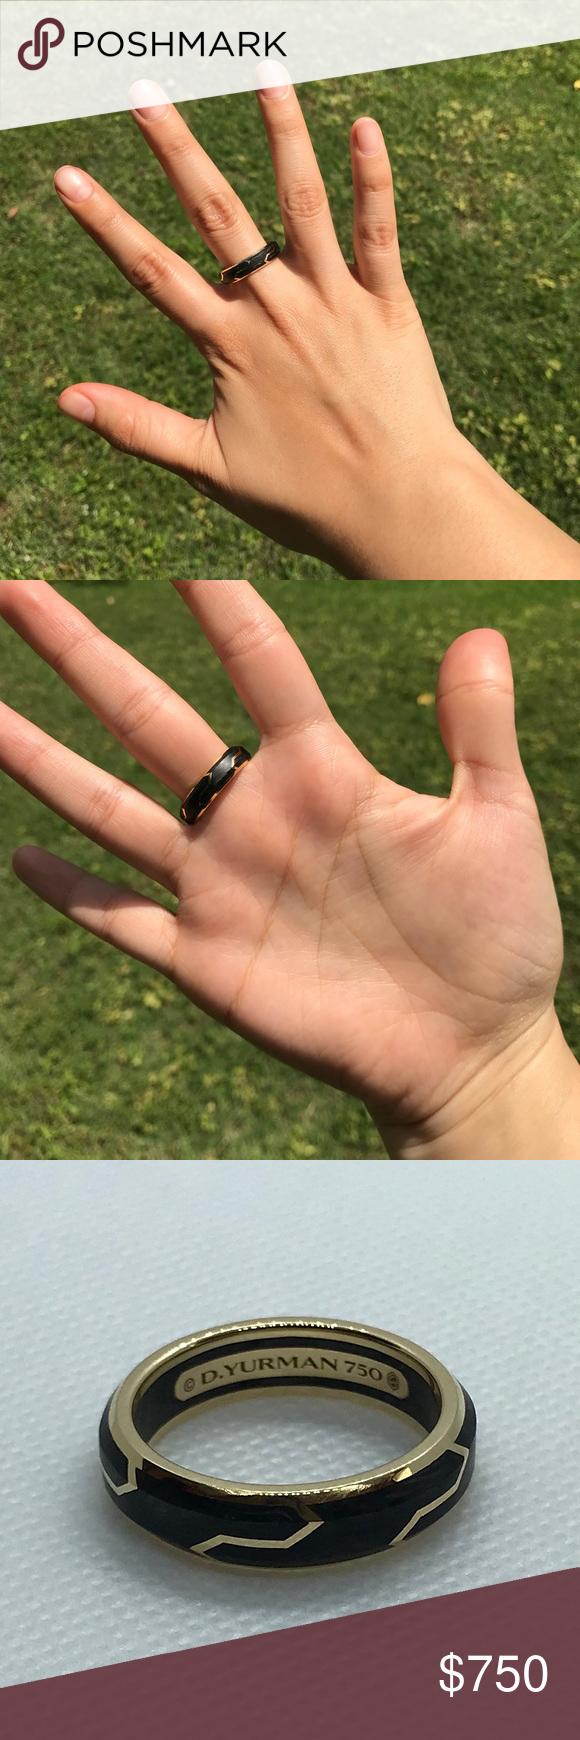 David Yurman 18k Gold Carbon Rings Mens Size 10 David Yurman 18k Yellow Gold Forged Carbon Mens Ring Size 10 Weig Rings For Men Mens Ring Sizes Size 10 Rings